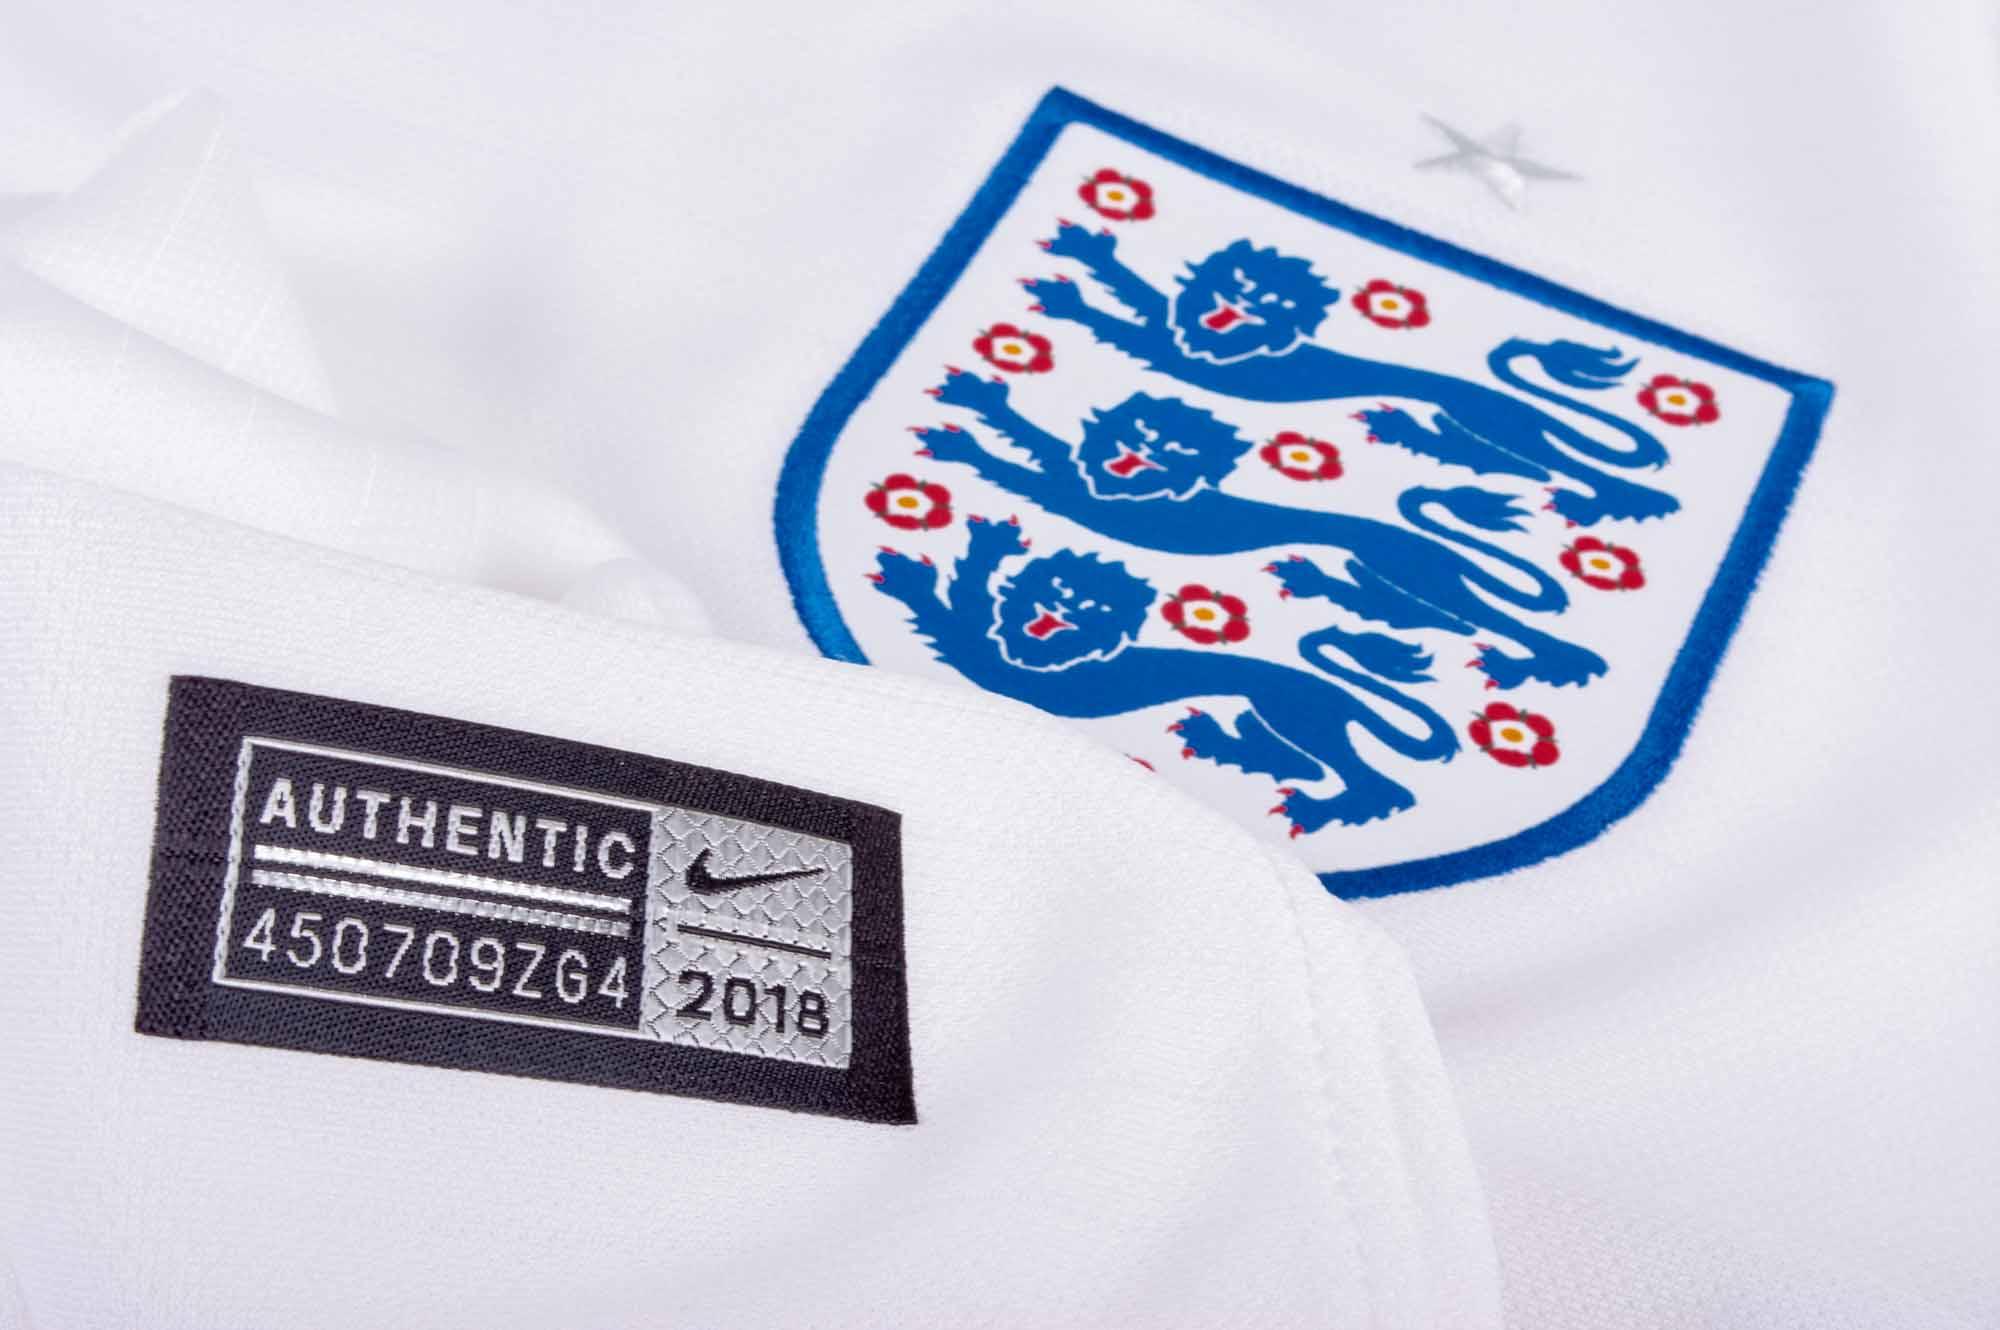 separation shoes 025f7 24c09 Nike England Dele Alli Home Jersey 2018-19 - SoccerPro.com